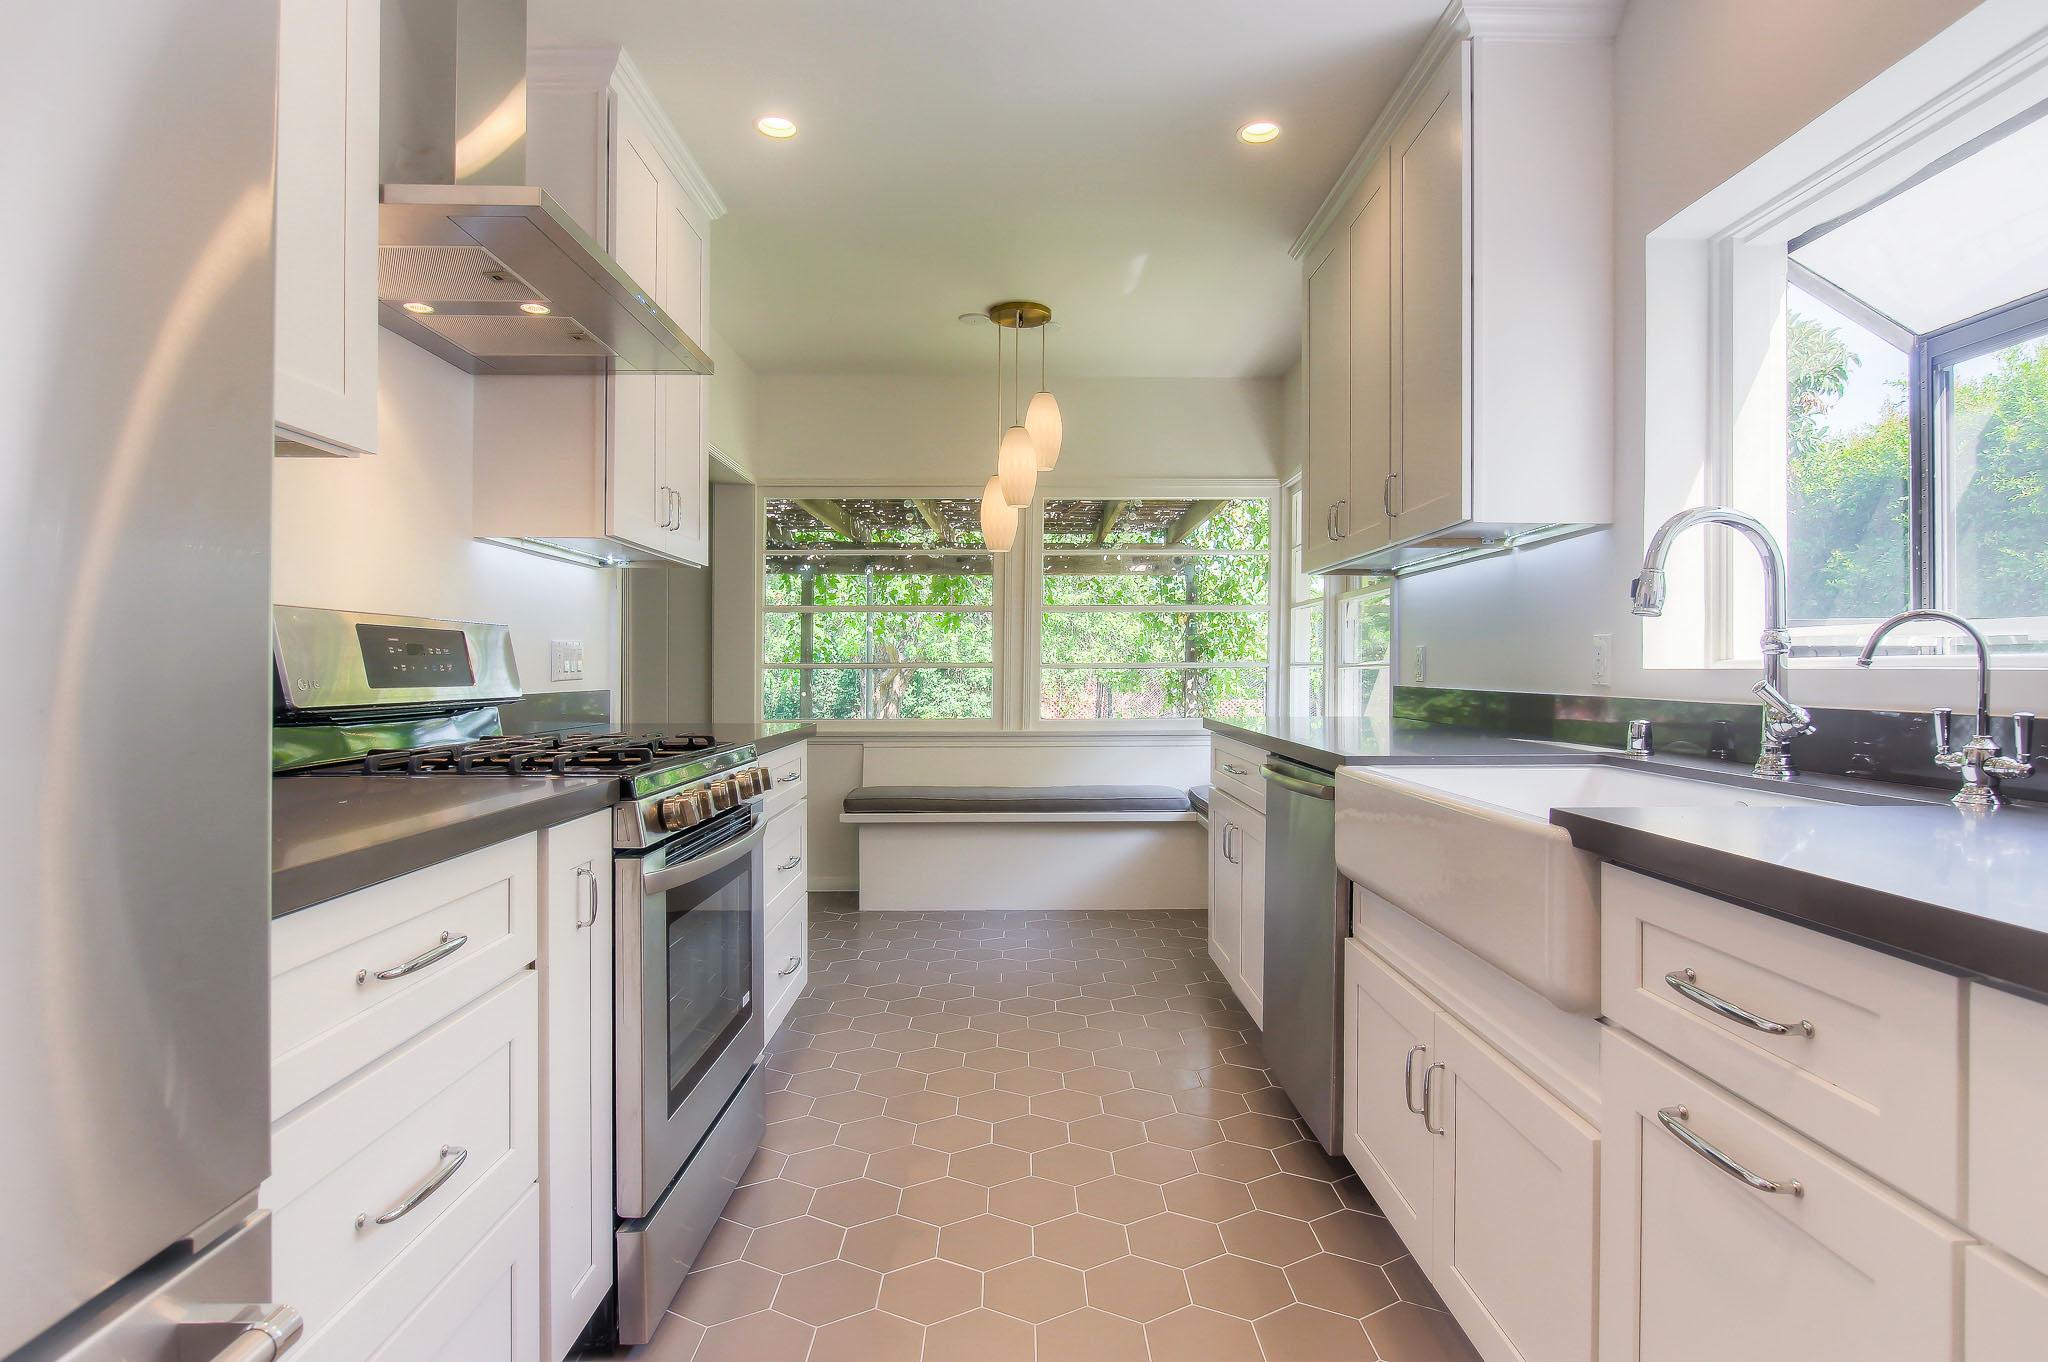 beverly hills kitchen remodel web.jpg